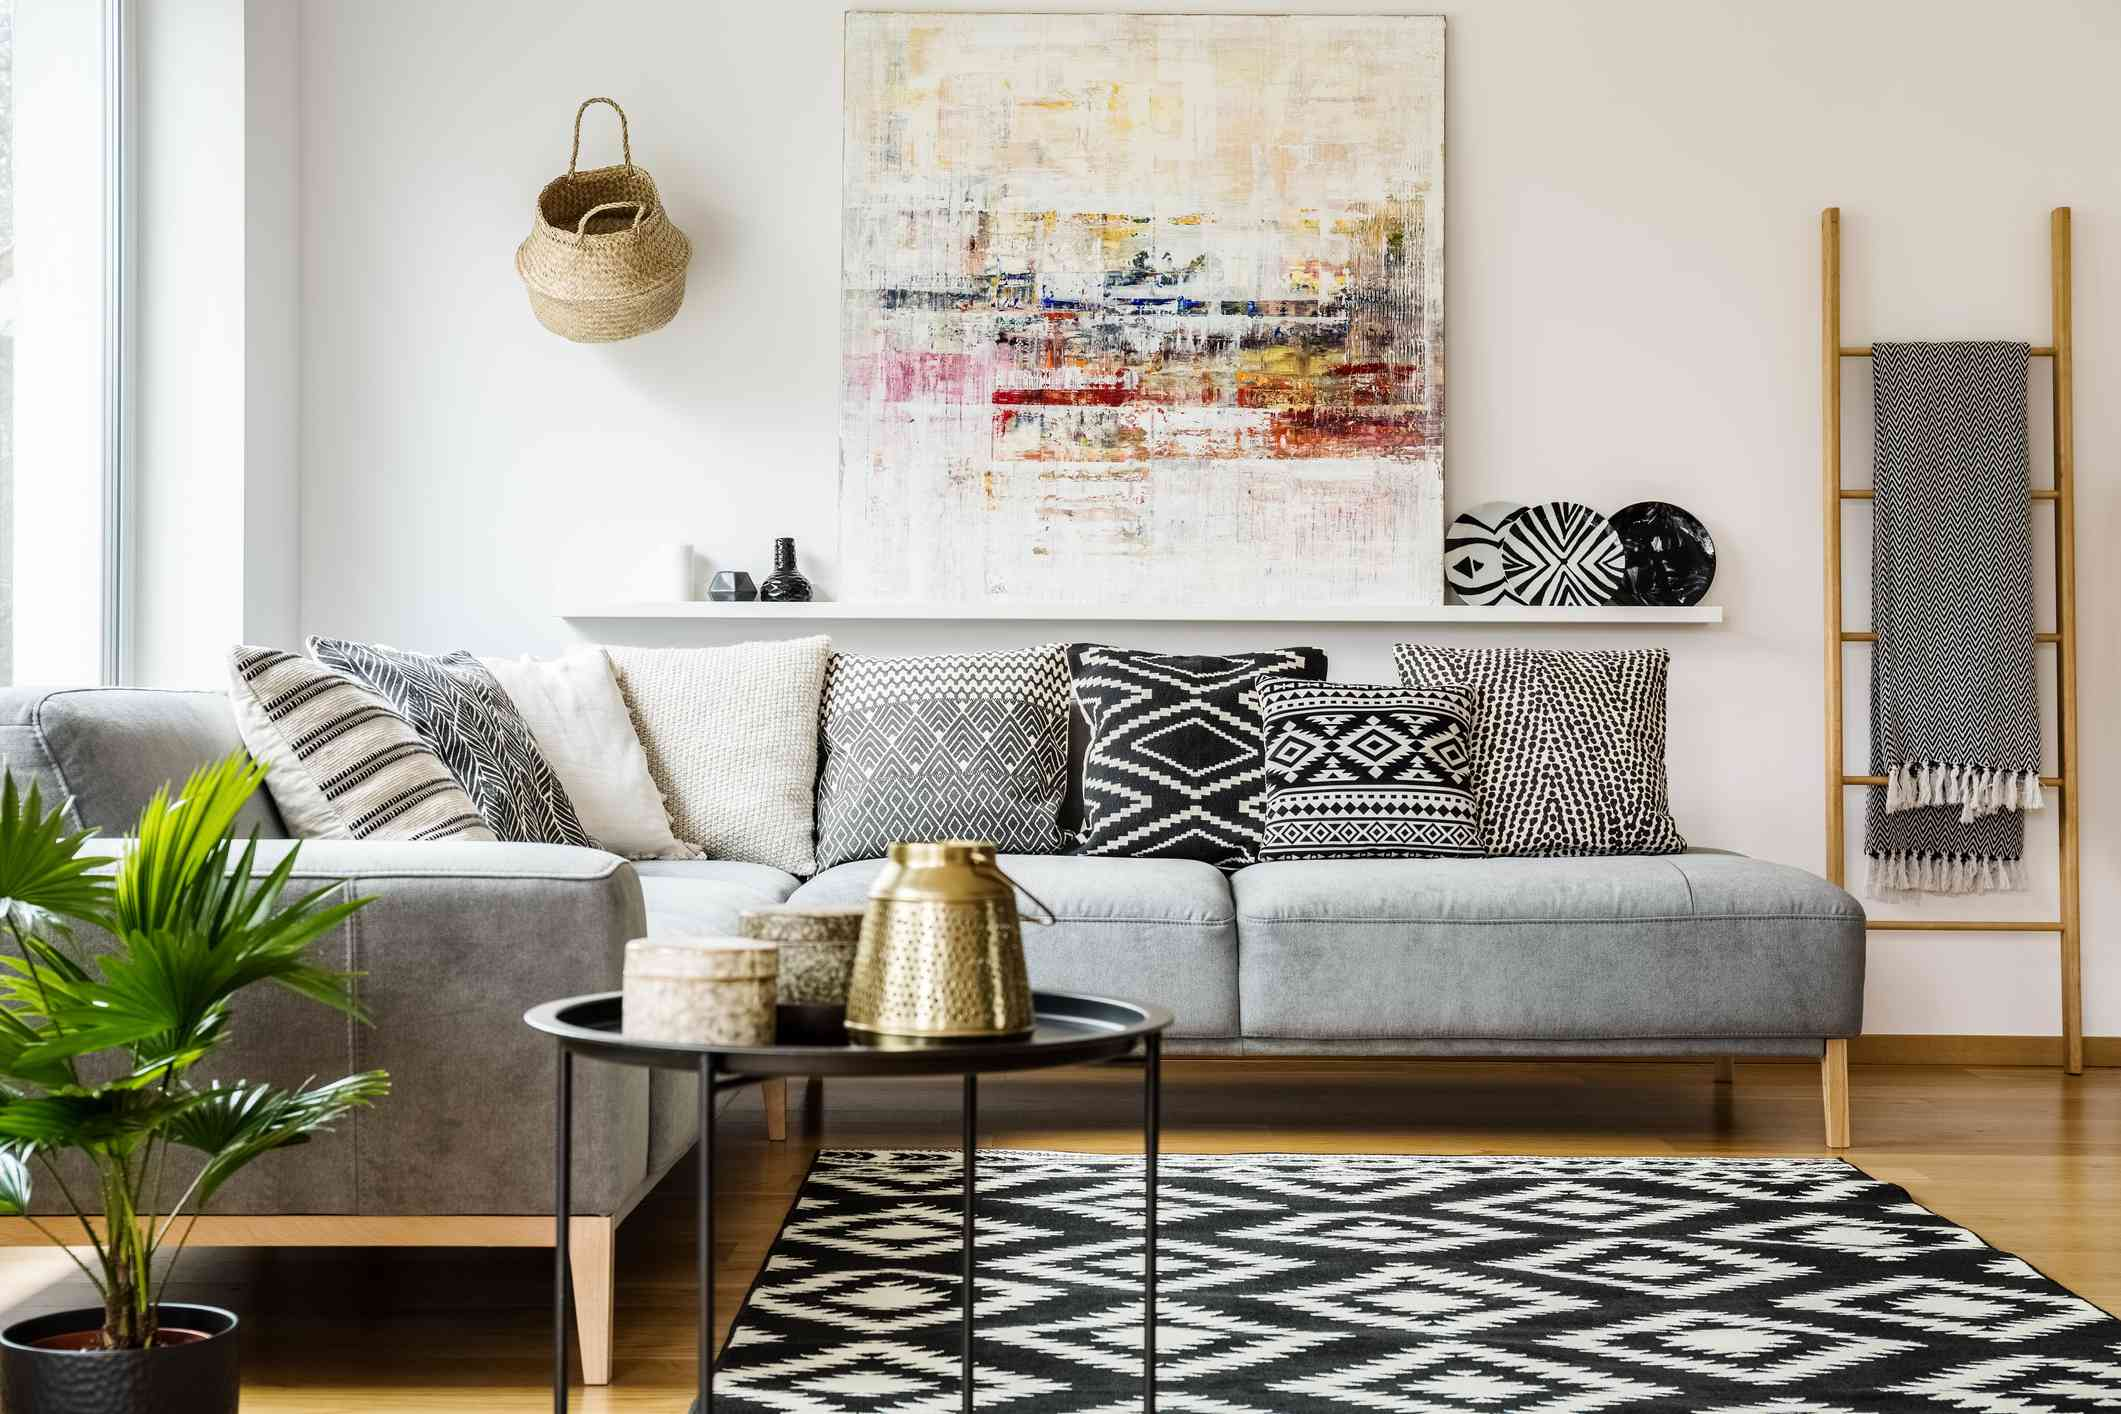 A boho style living room